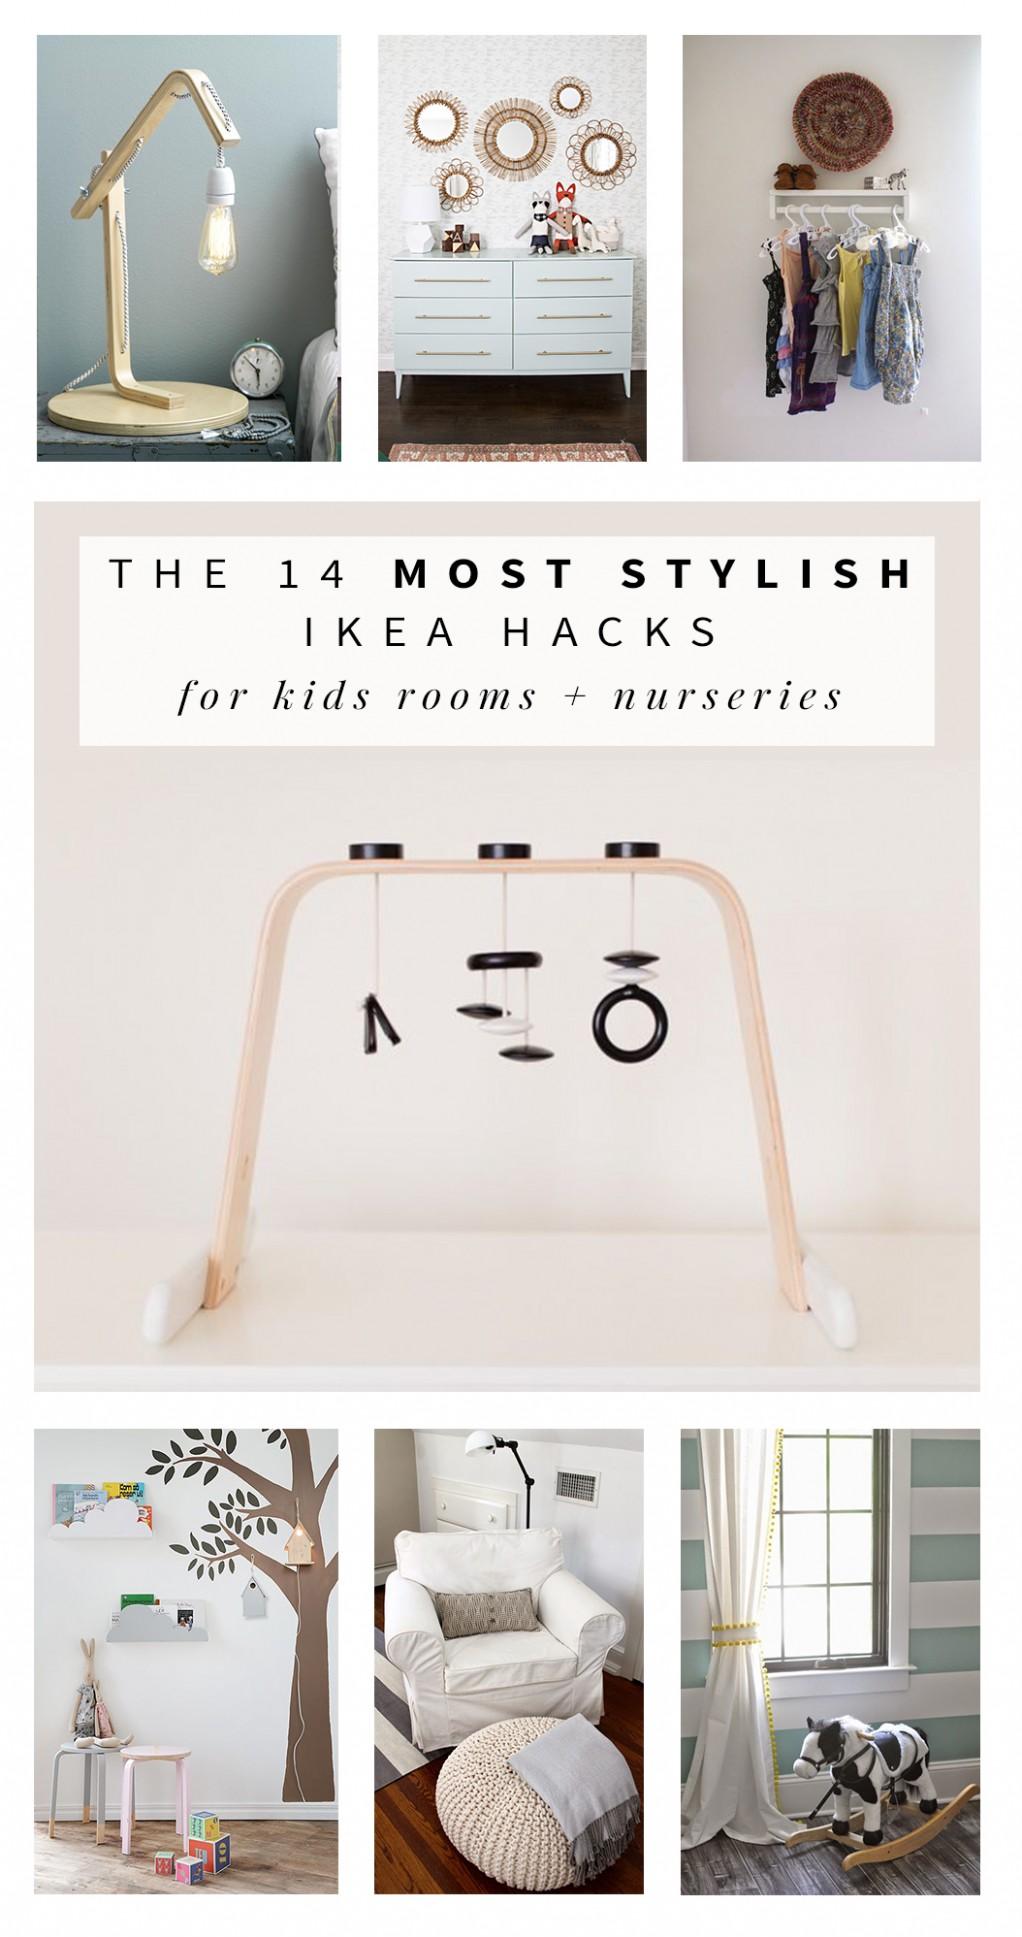 Stylish Ikea Hacks for Kids Rooms and Nurseries - Baby Room Hacks